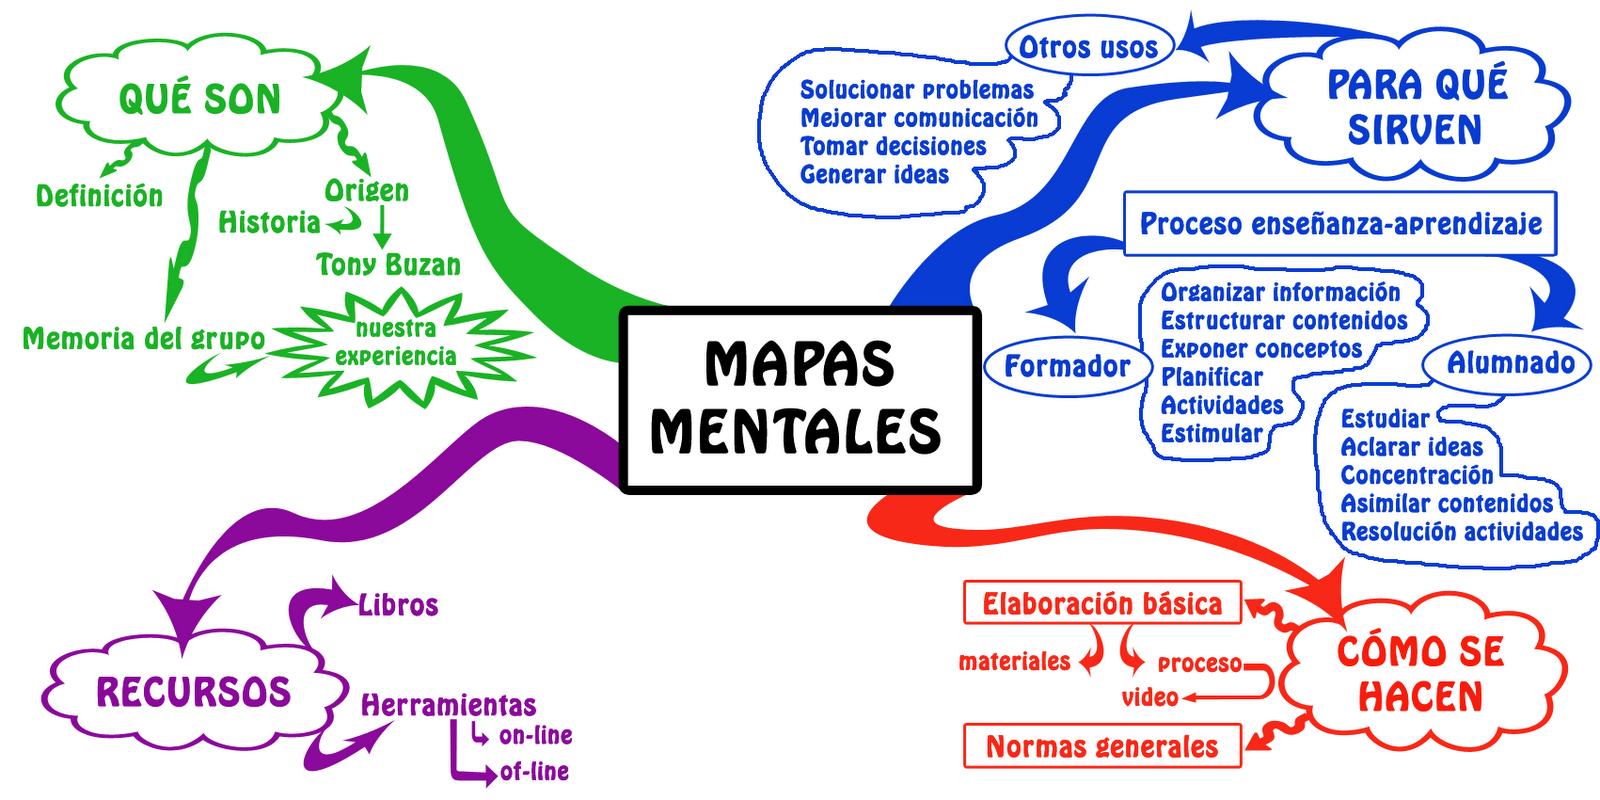 Risultati immagini per mapas mentales ejemplos